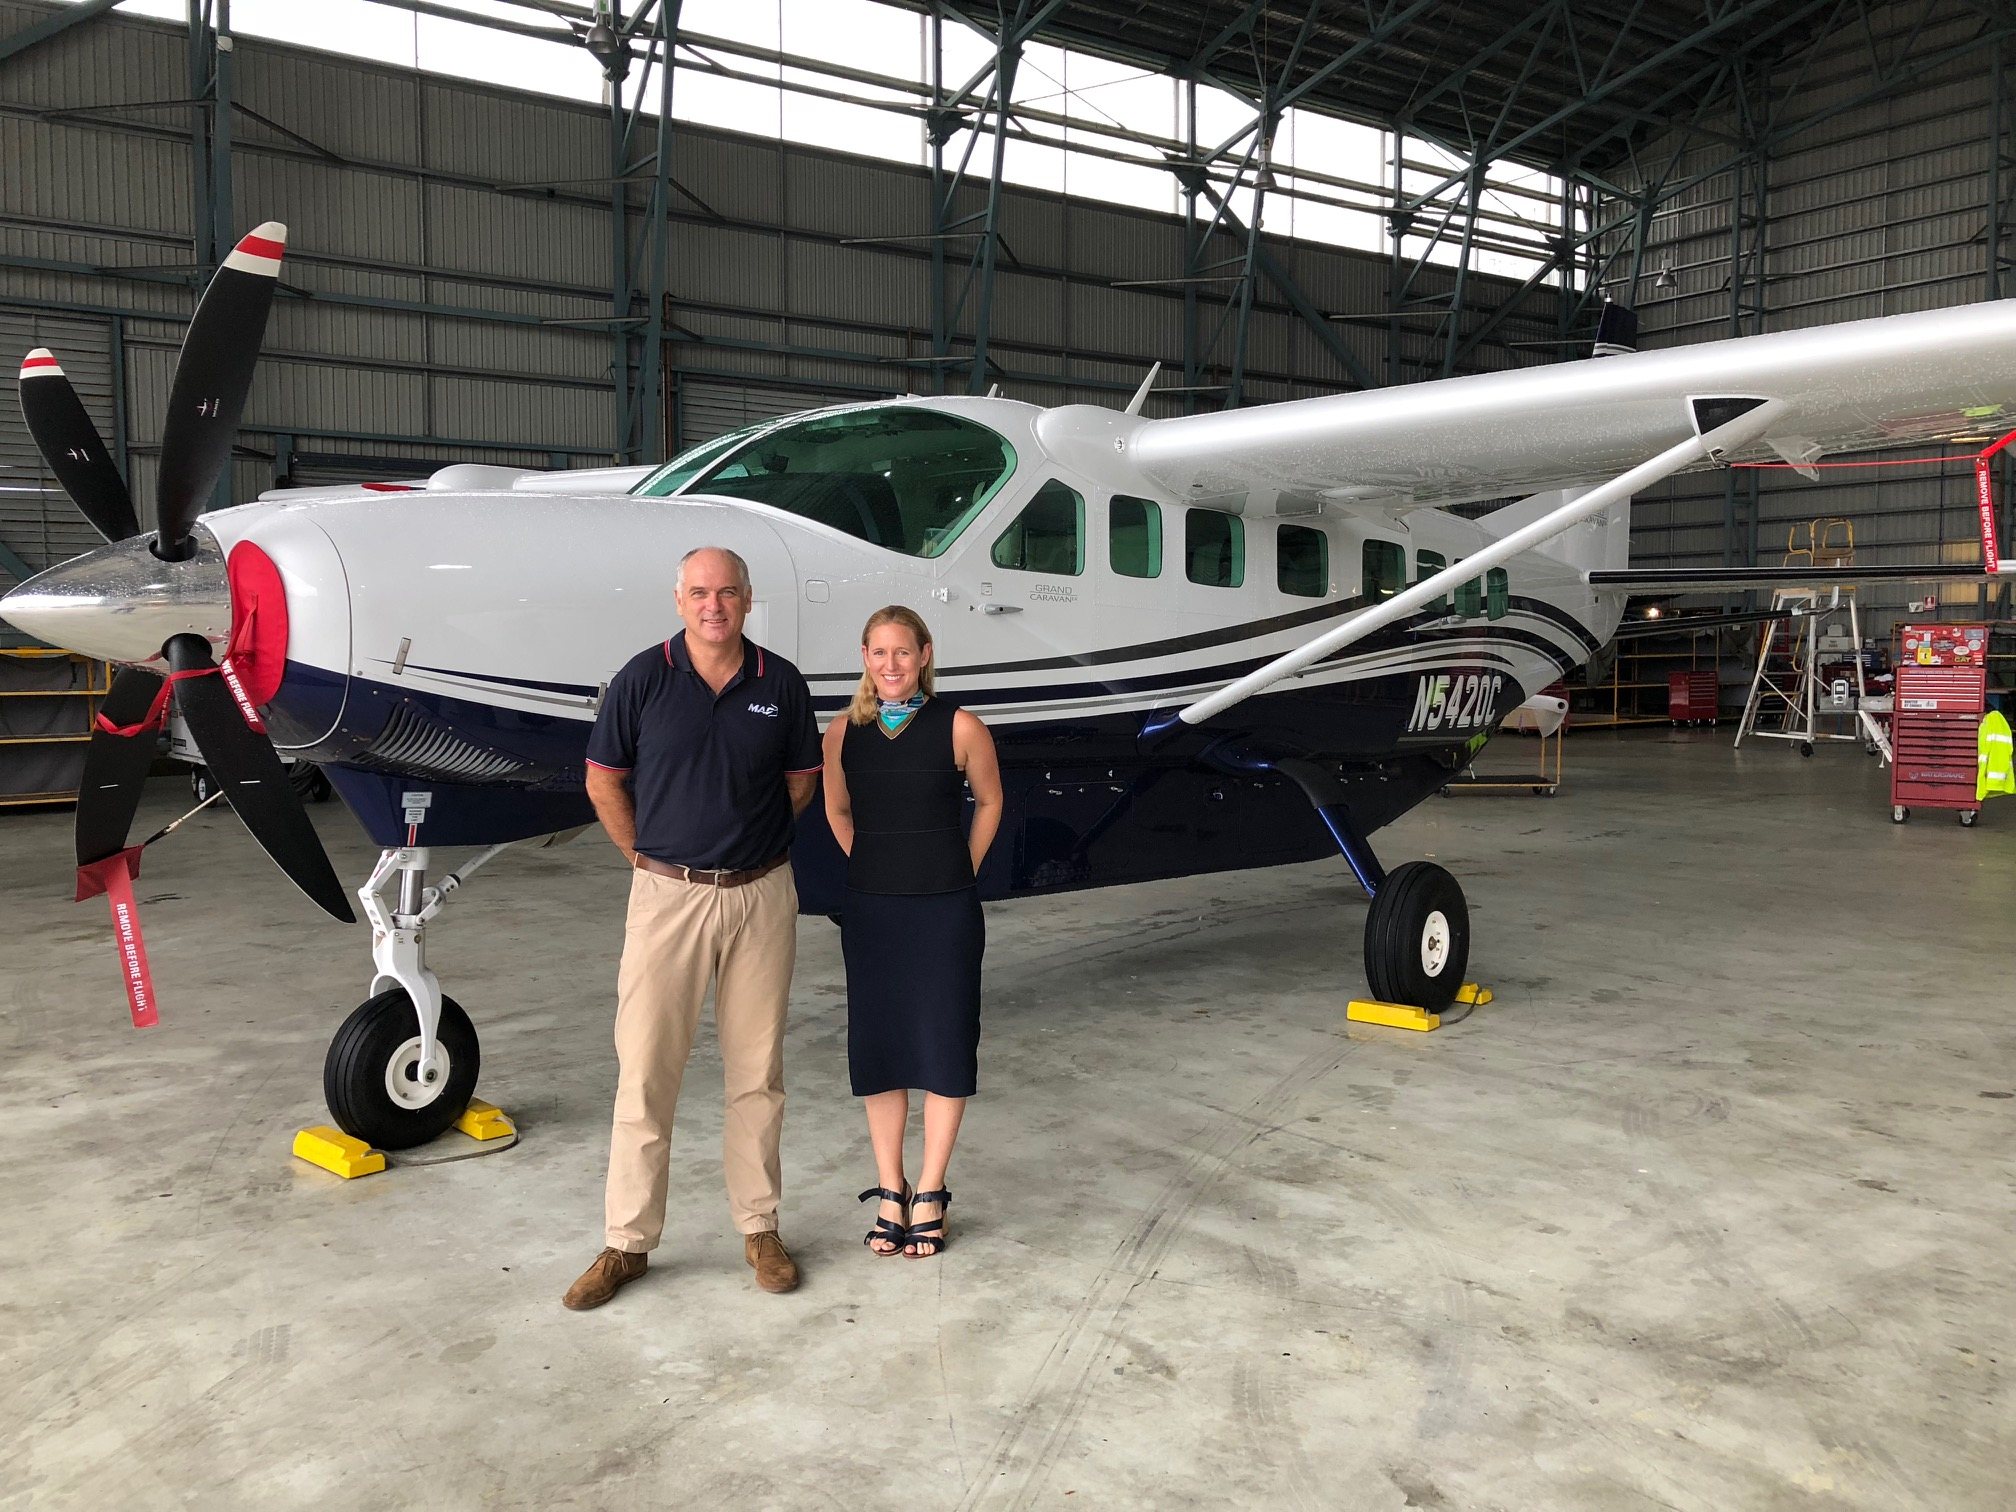 Textron Inc - Textron Aviation and Mission Aviation Fellowship